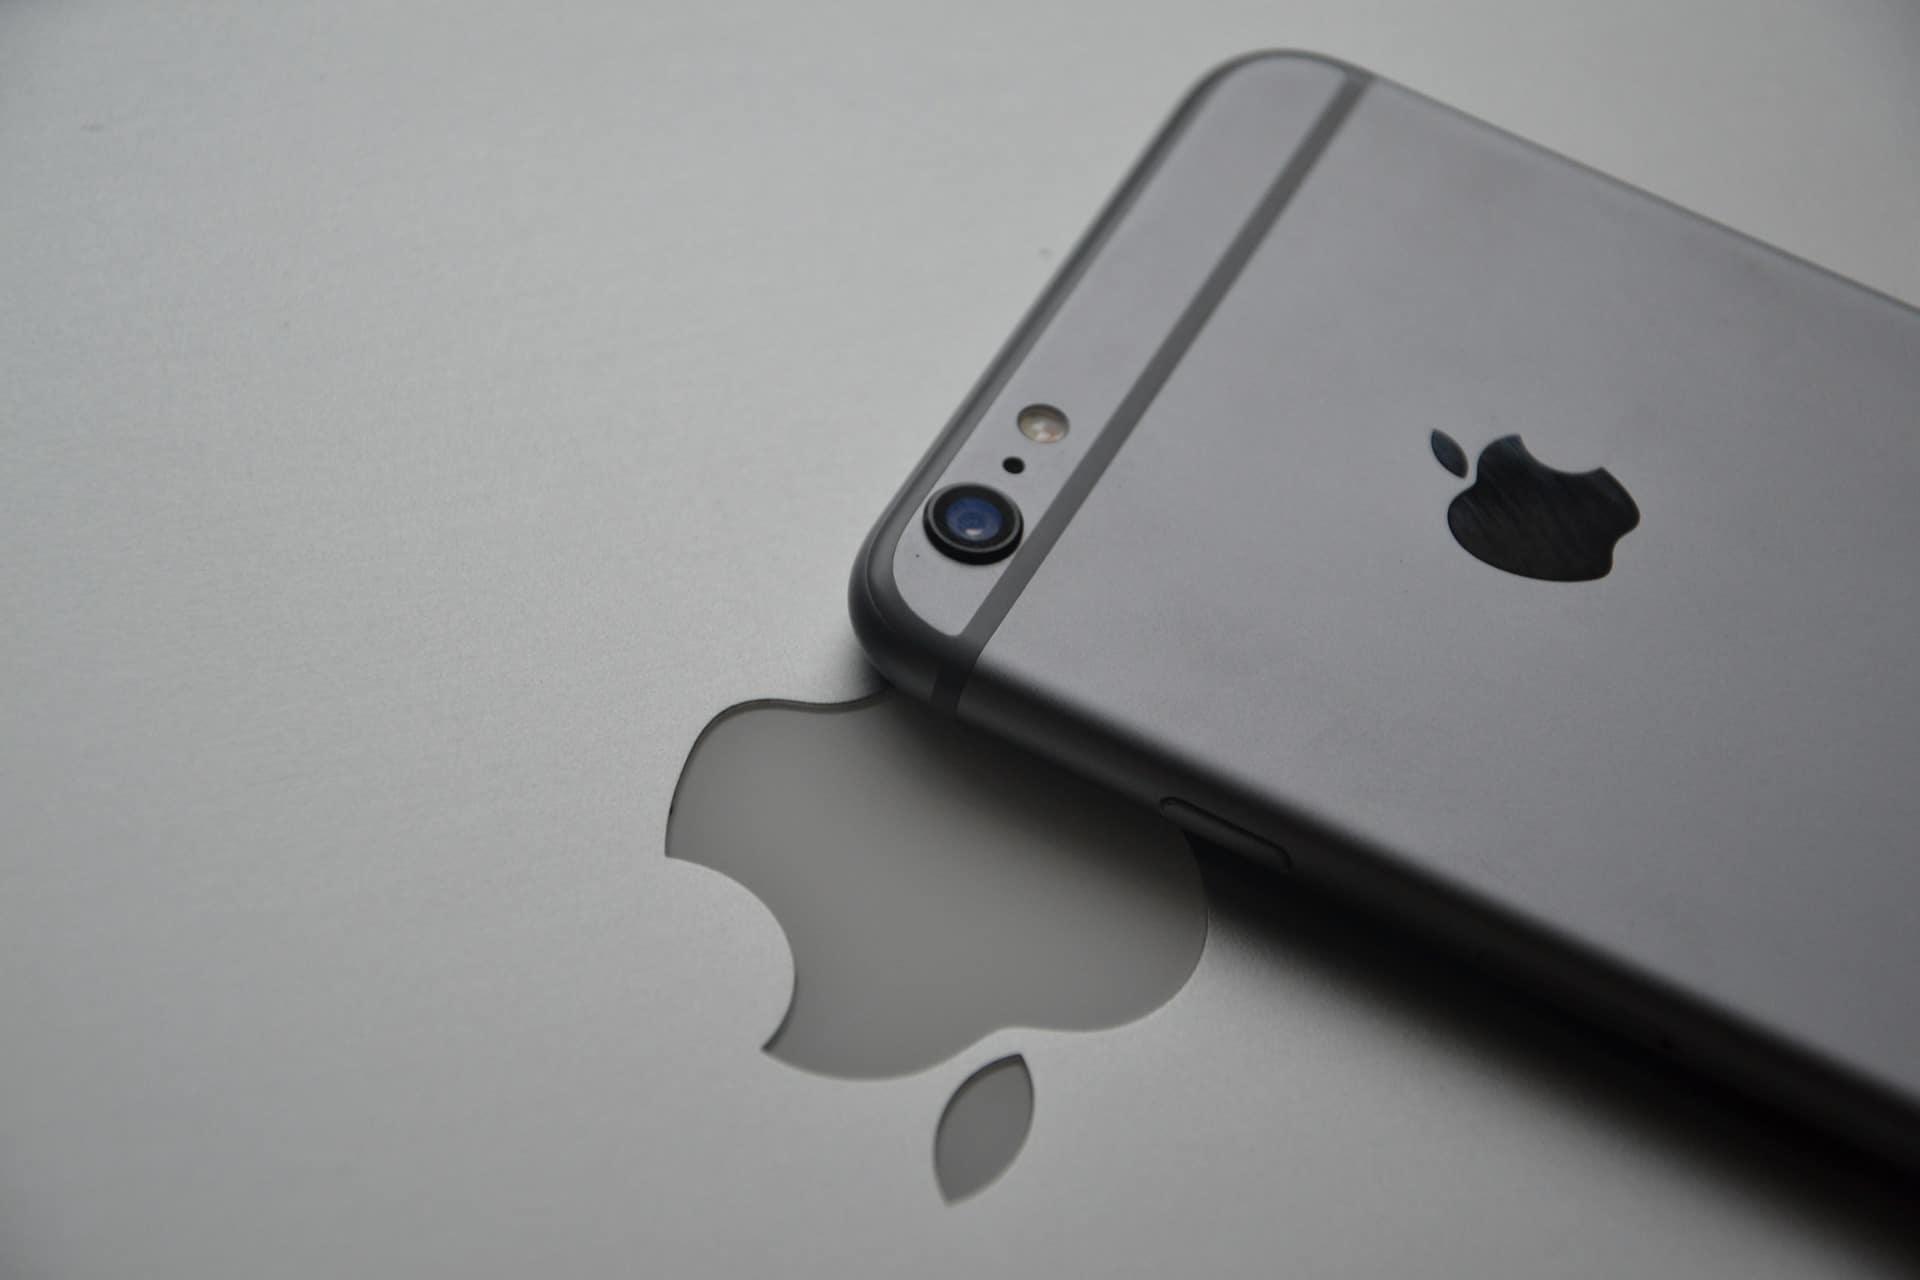 Apple - alignthoughts.com